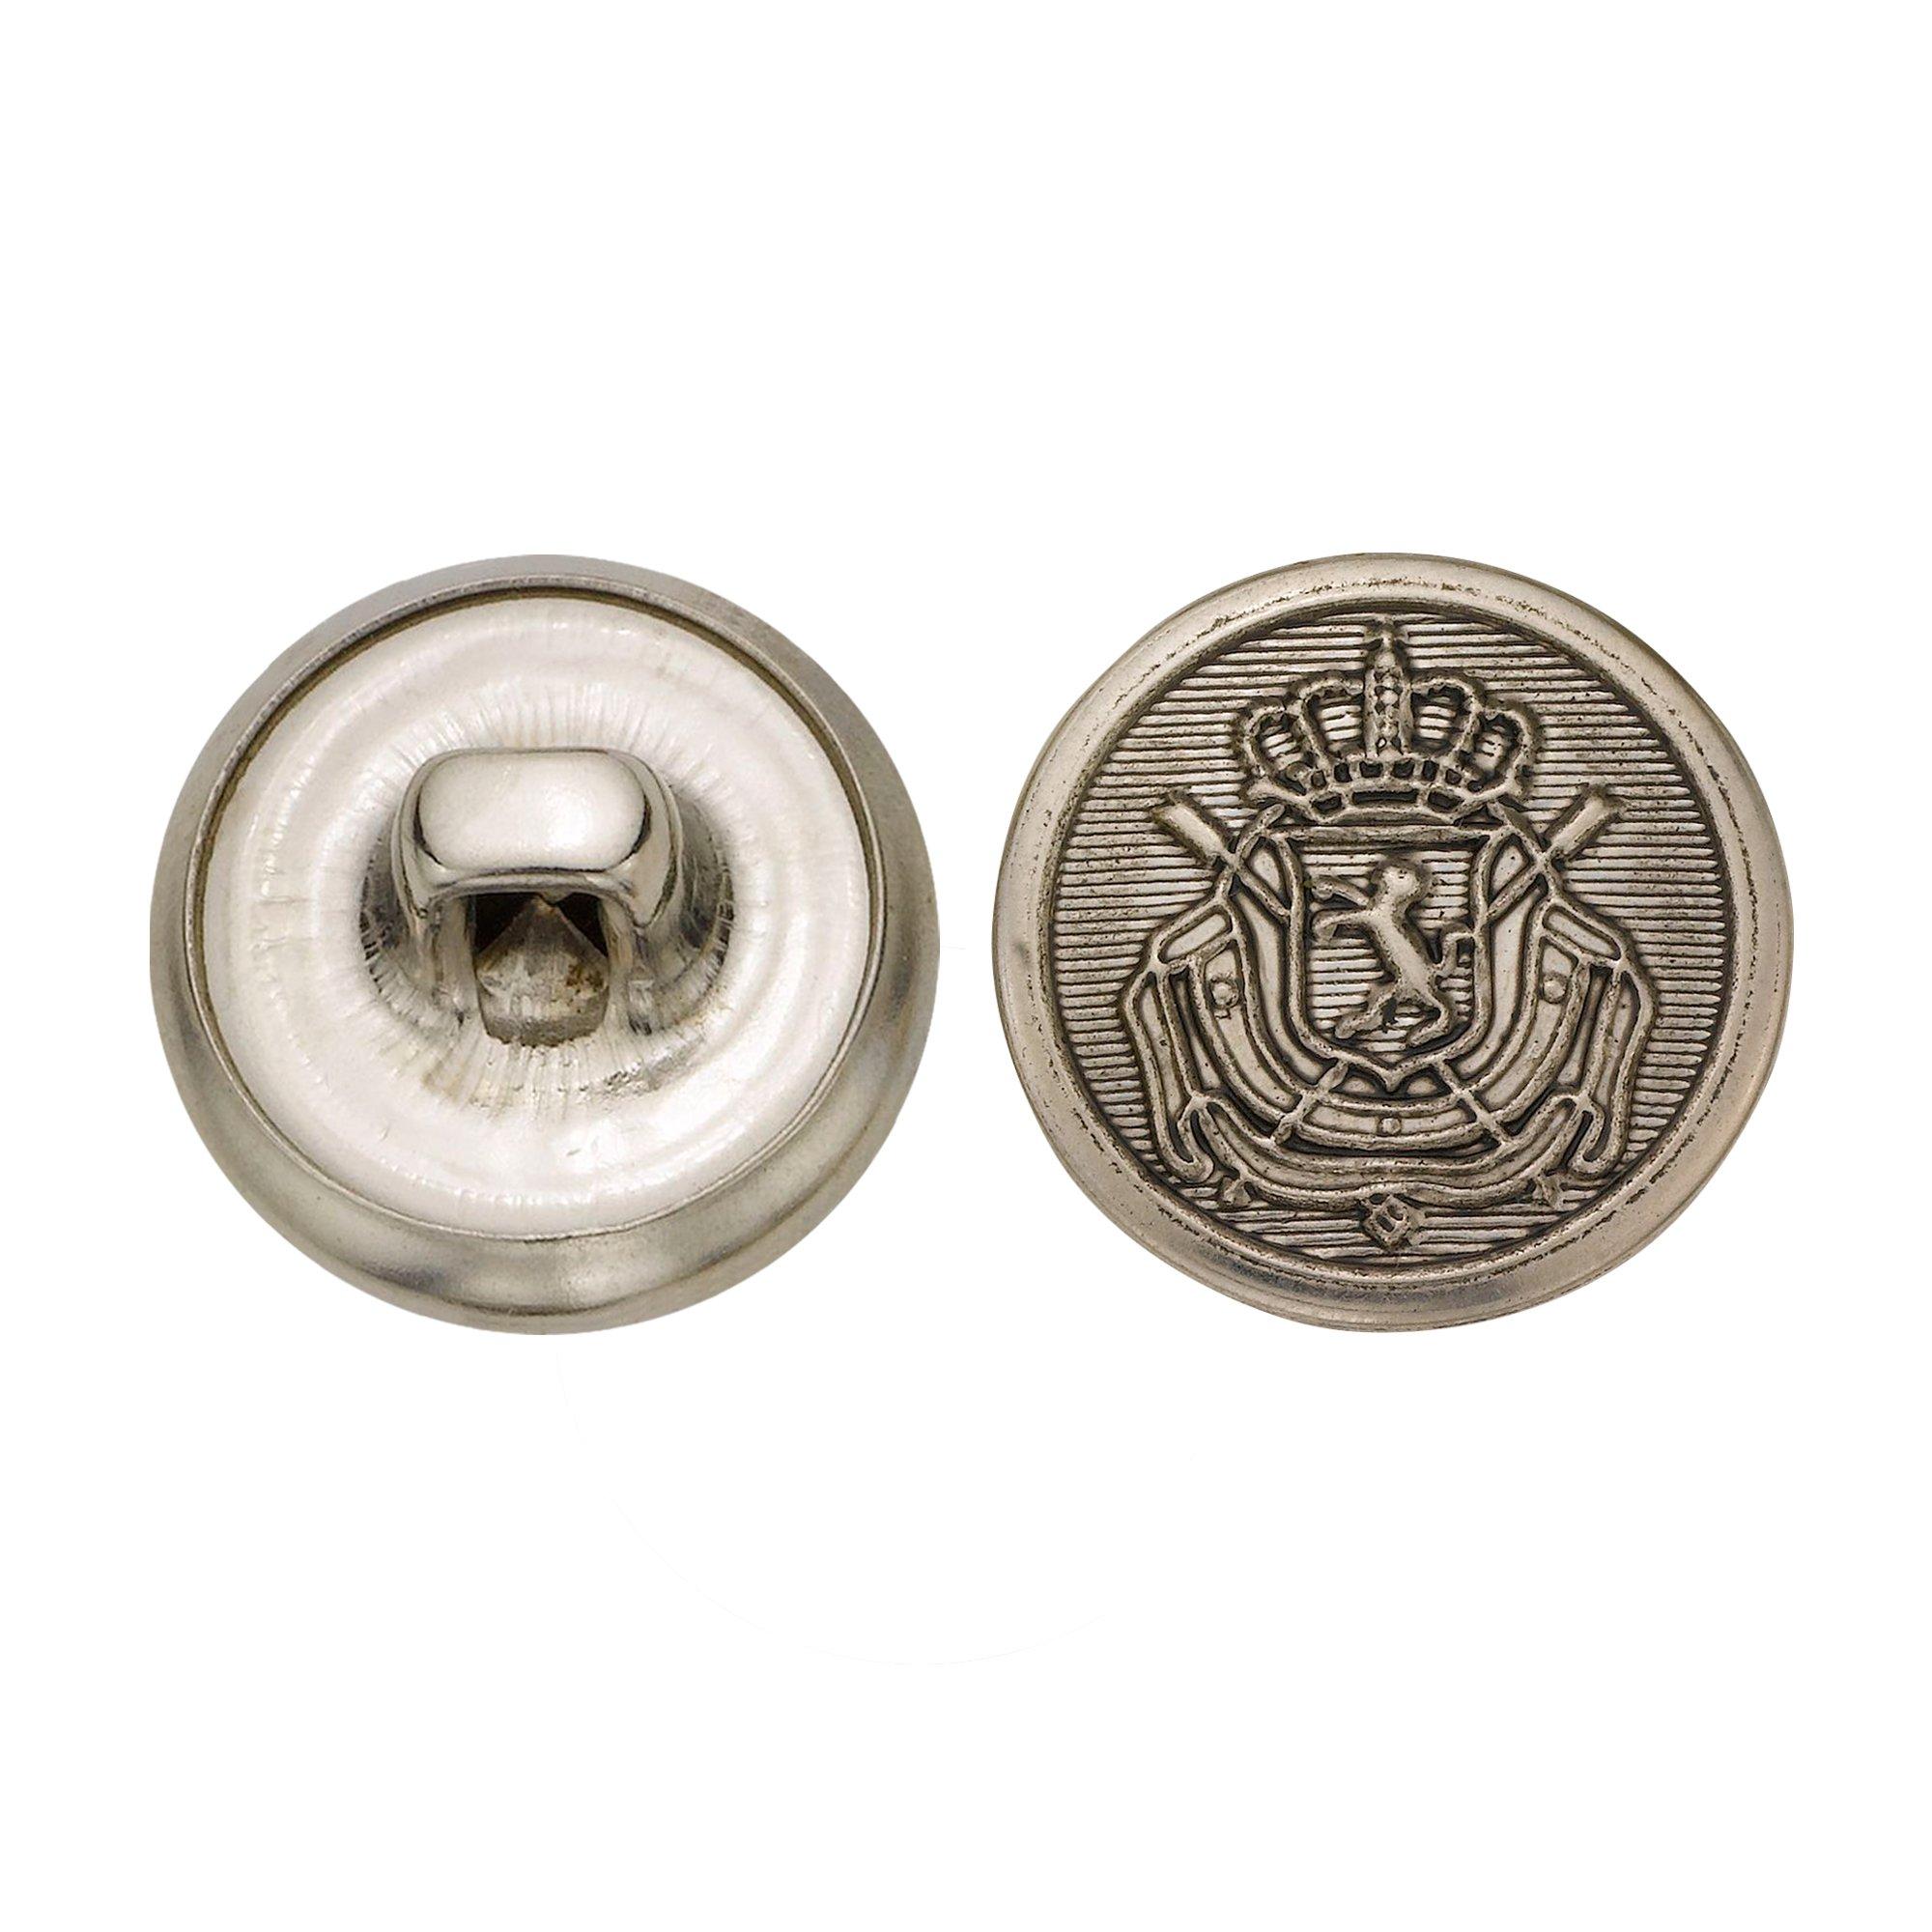 C&C Metal Products 5289 Royal Crest Metal Button, Size 24 Ligne, Antique Nickel, 72-Pack